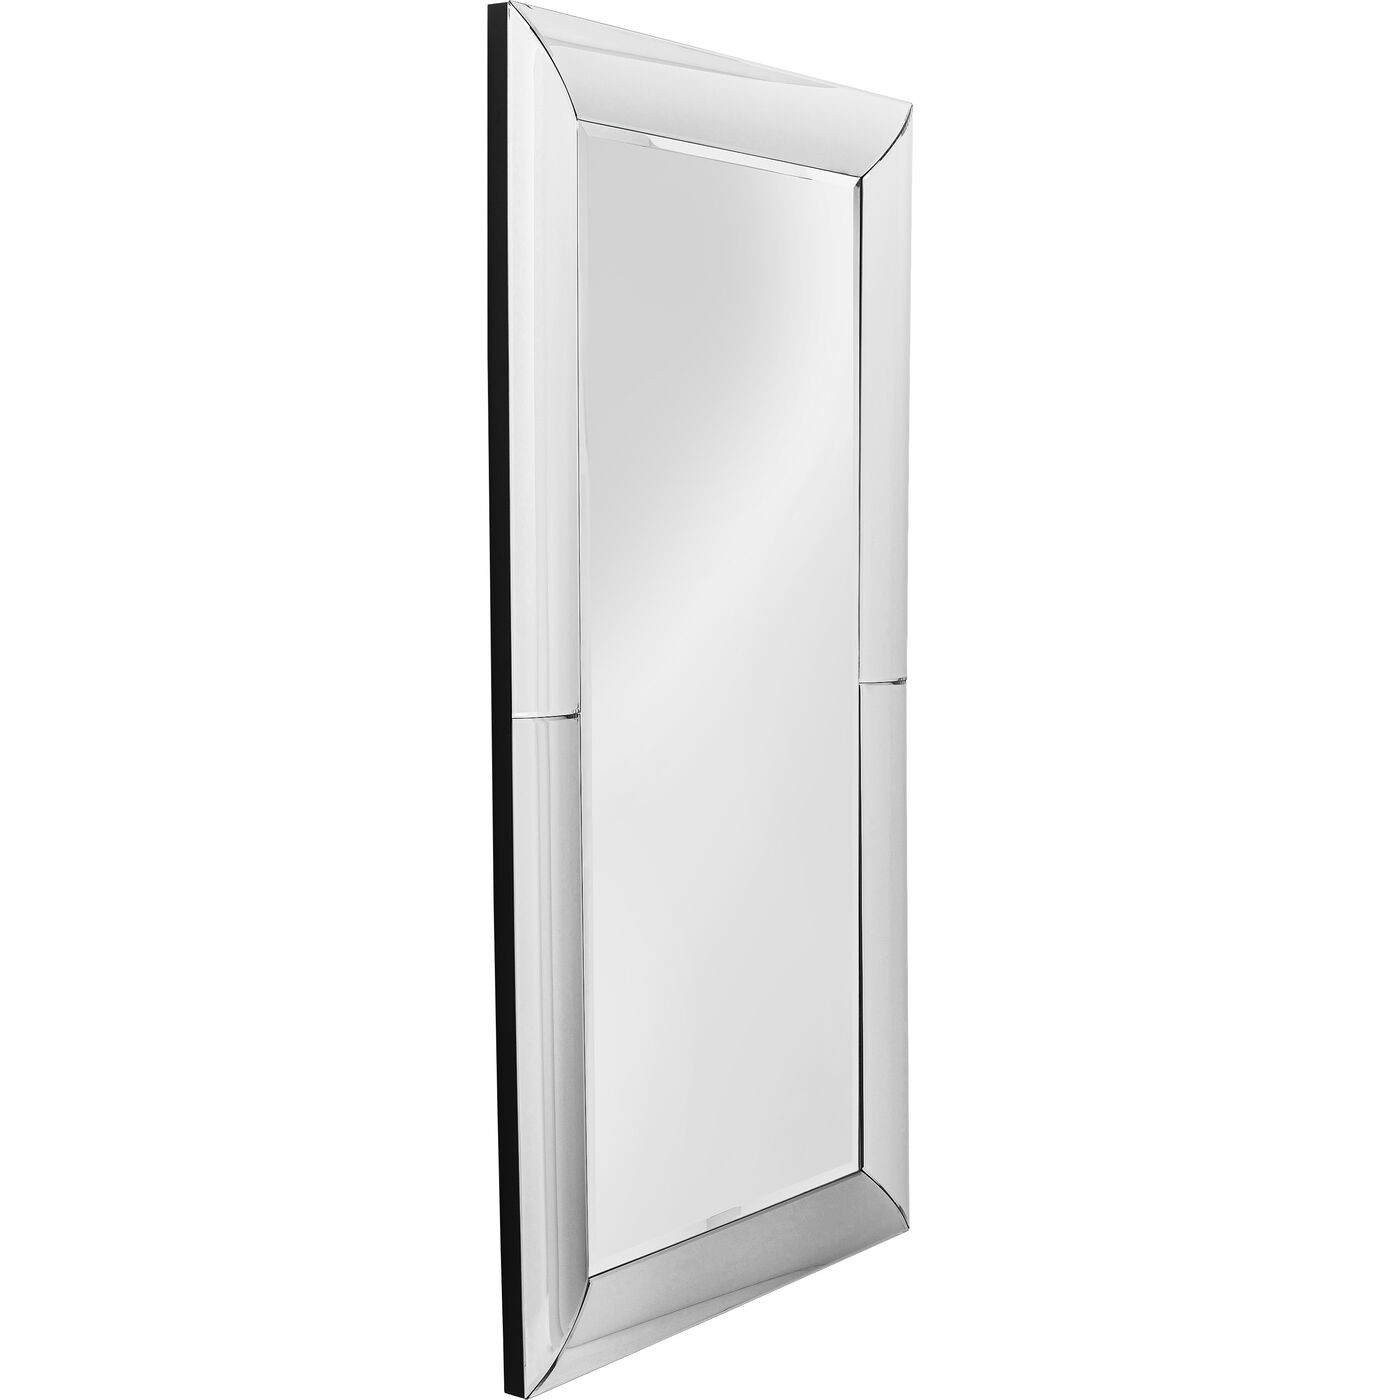 Miroir Bounce rectangulaire 160x80cm Kare Design